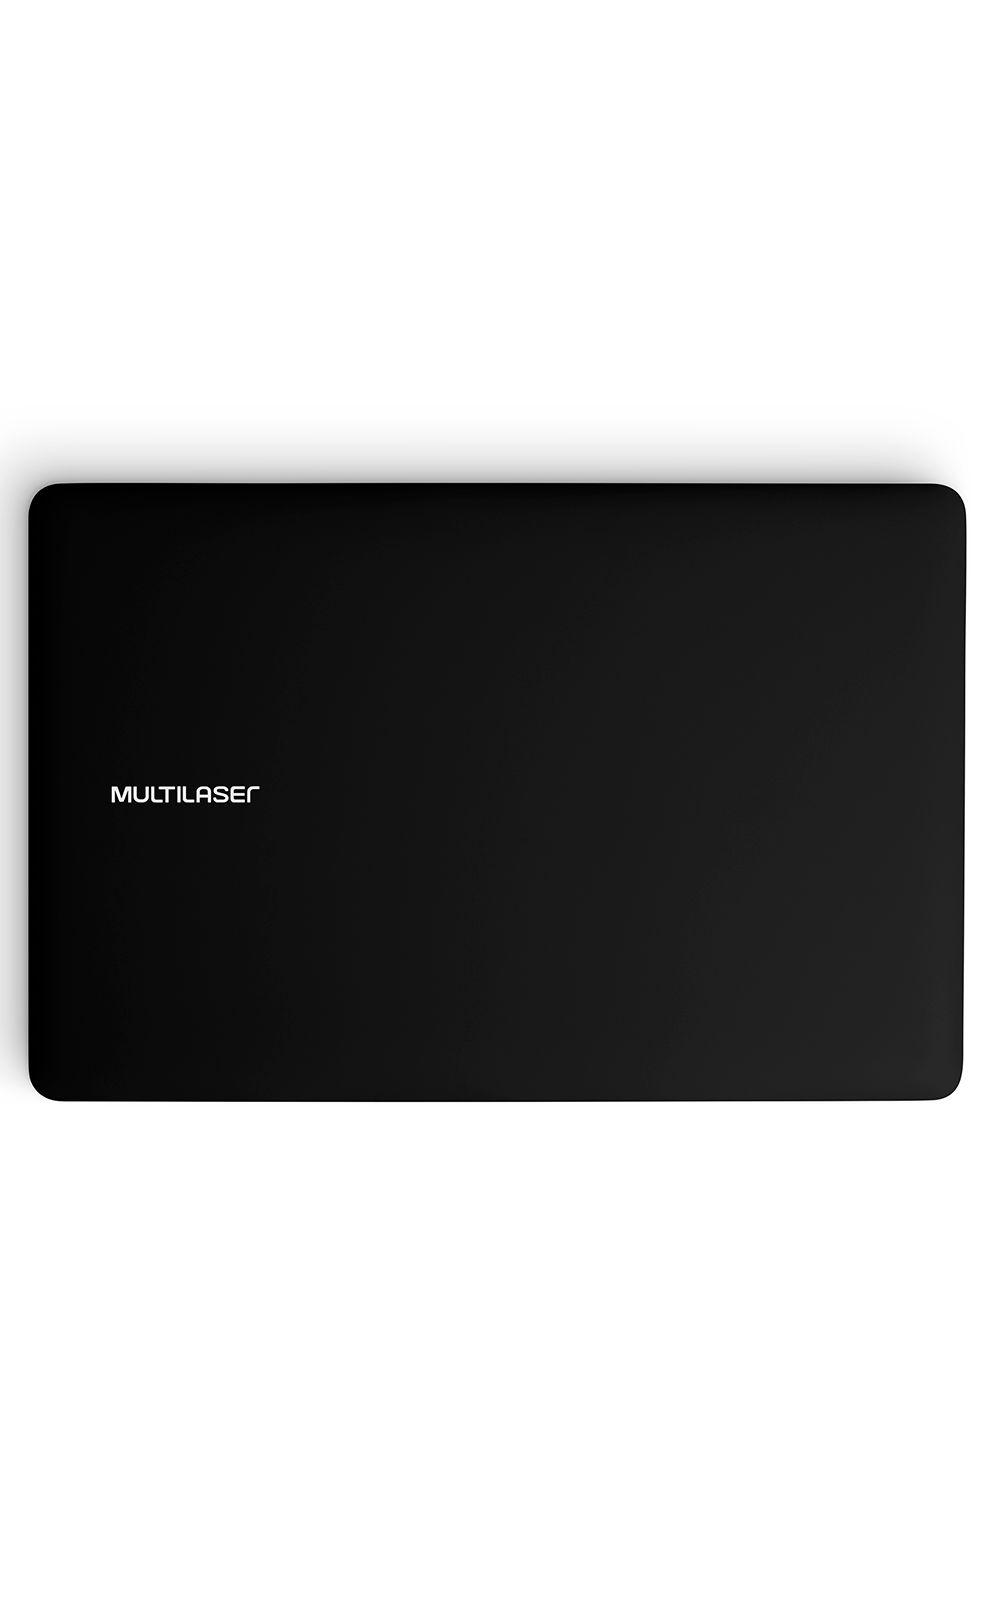 Foto 4 - Notebook Legacy Intel Quad Core Tela Hd 14 Pol. Windows 10 Ram 2Gb Multilaser Preto - PC101